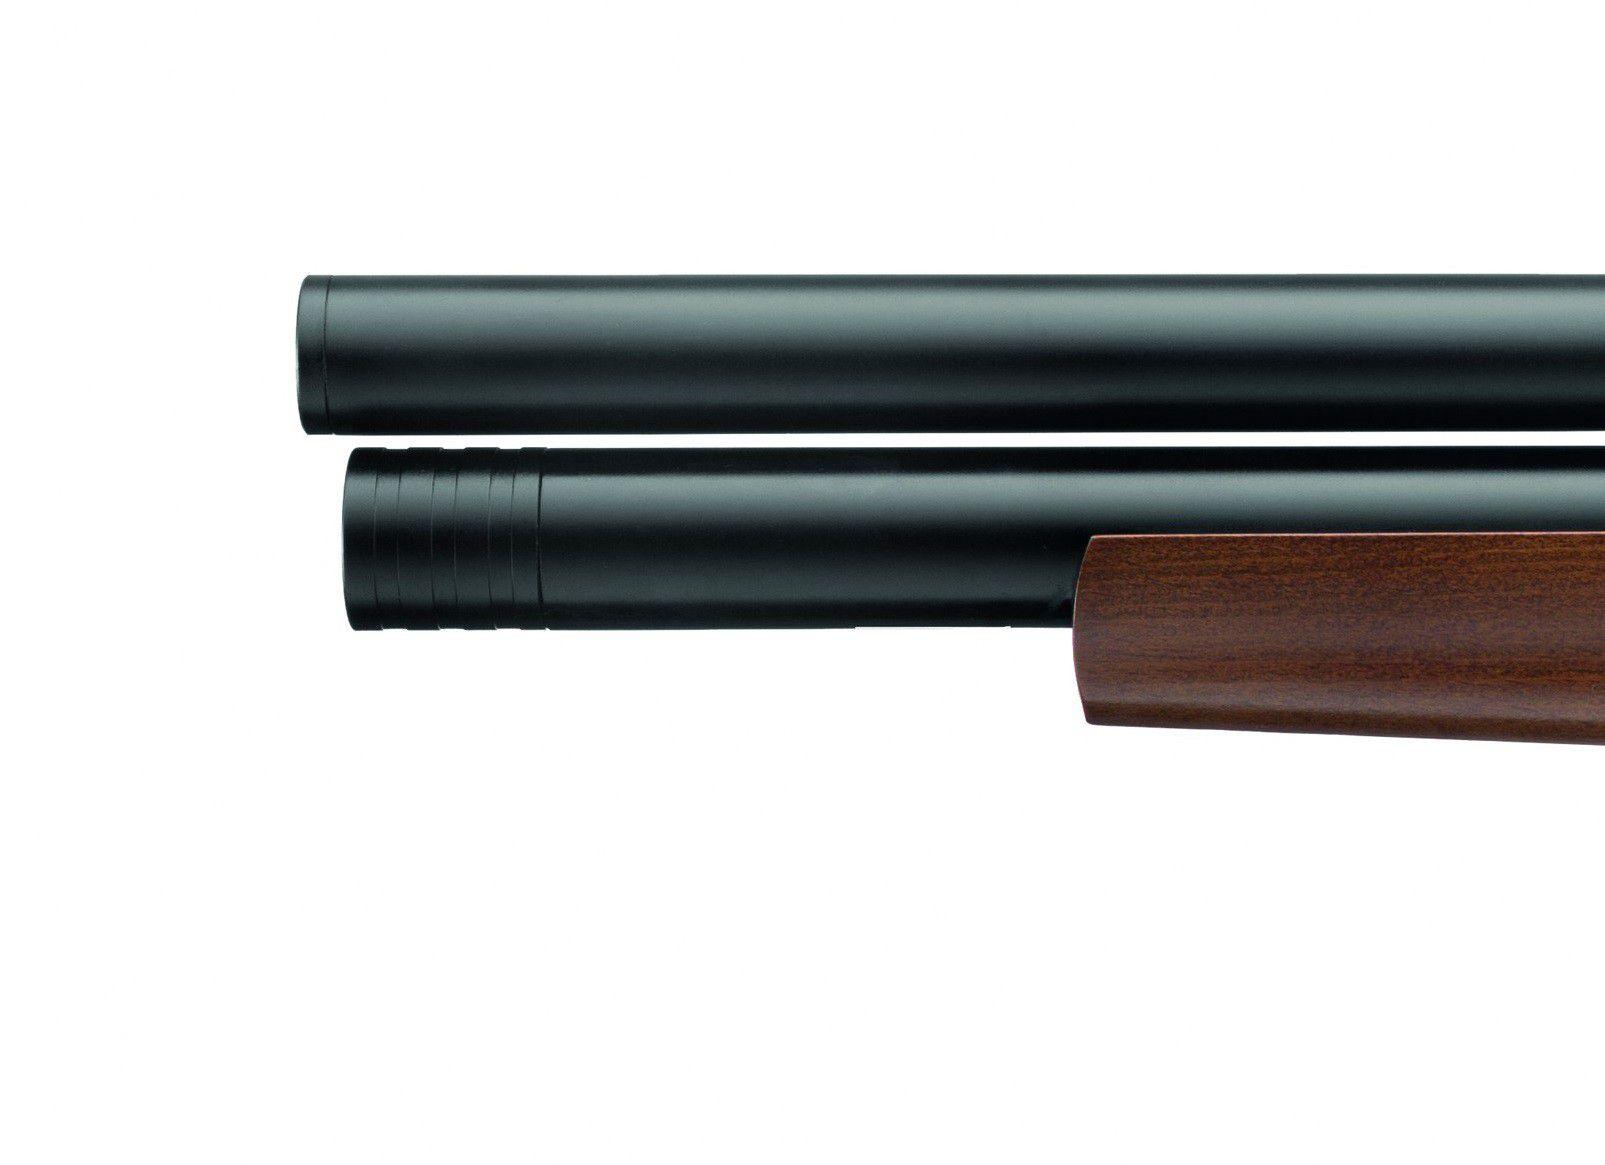 Carabina PCP STINGER Modelo Jupiter 5.5mm